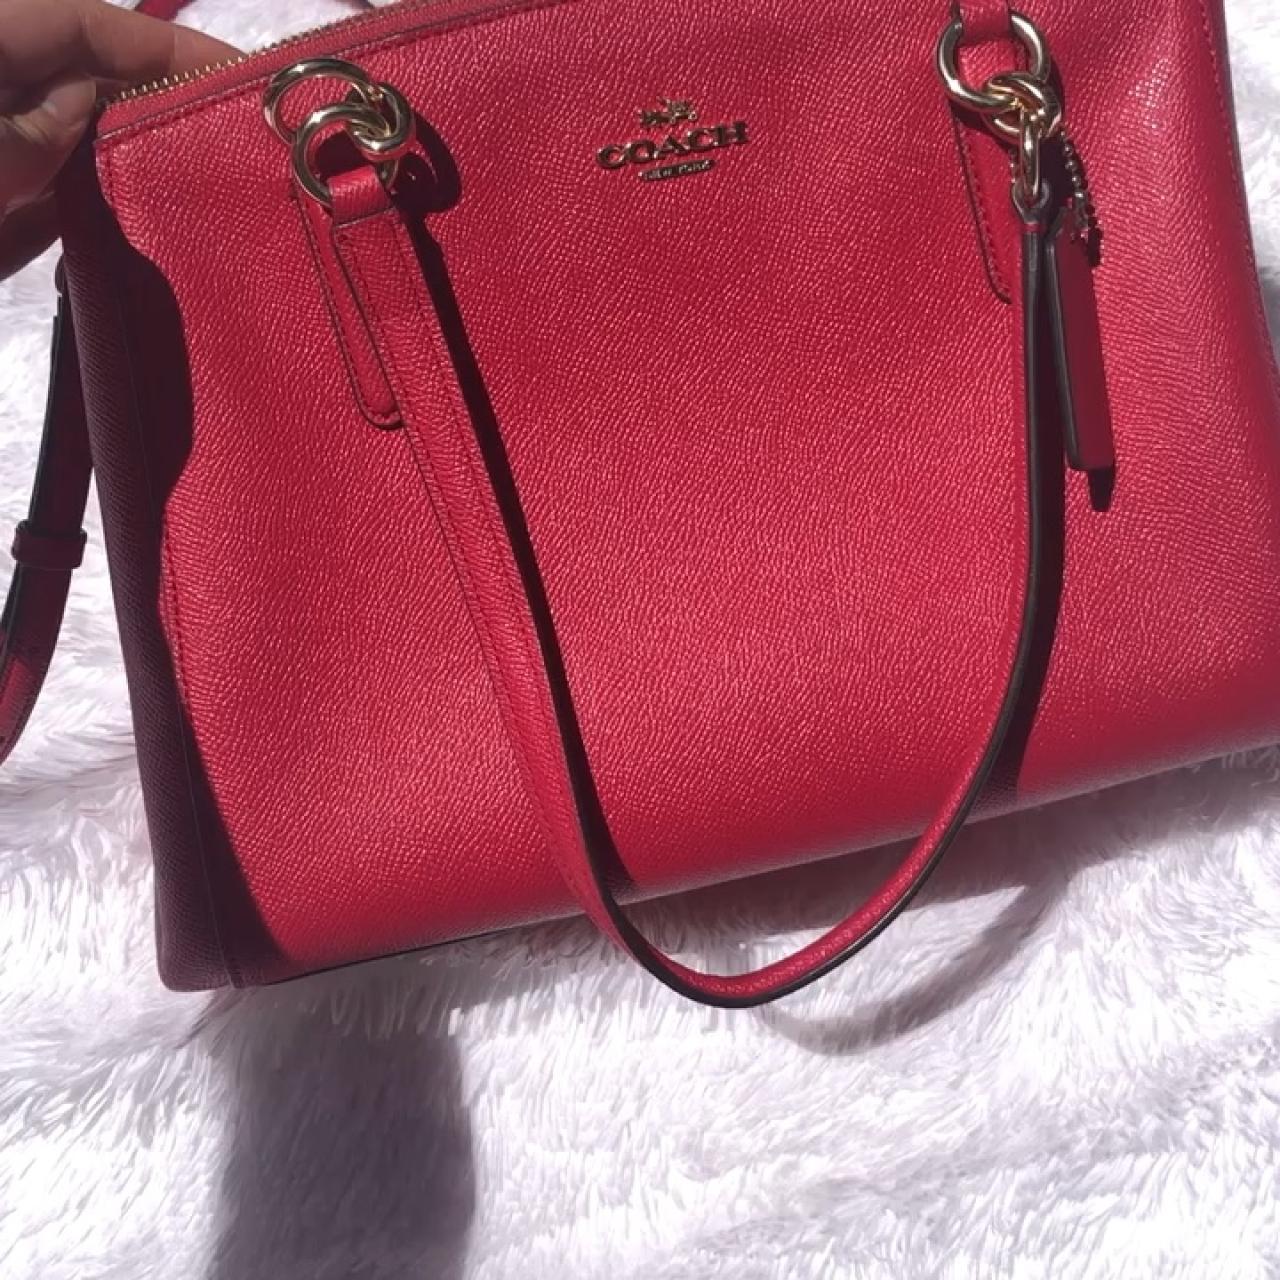 4fb825f23cf @yaelmariee. 3 days ago. Stroudsburg, United States. hot pink coach purse  ...